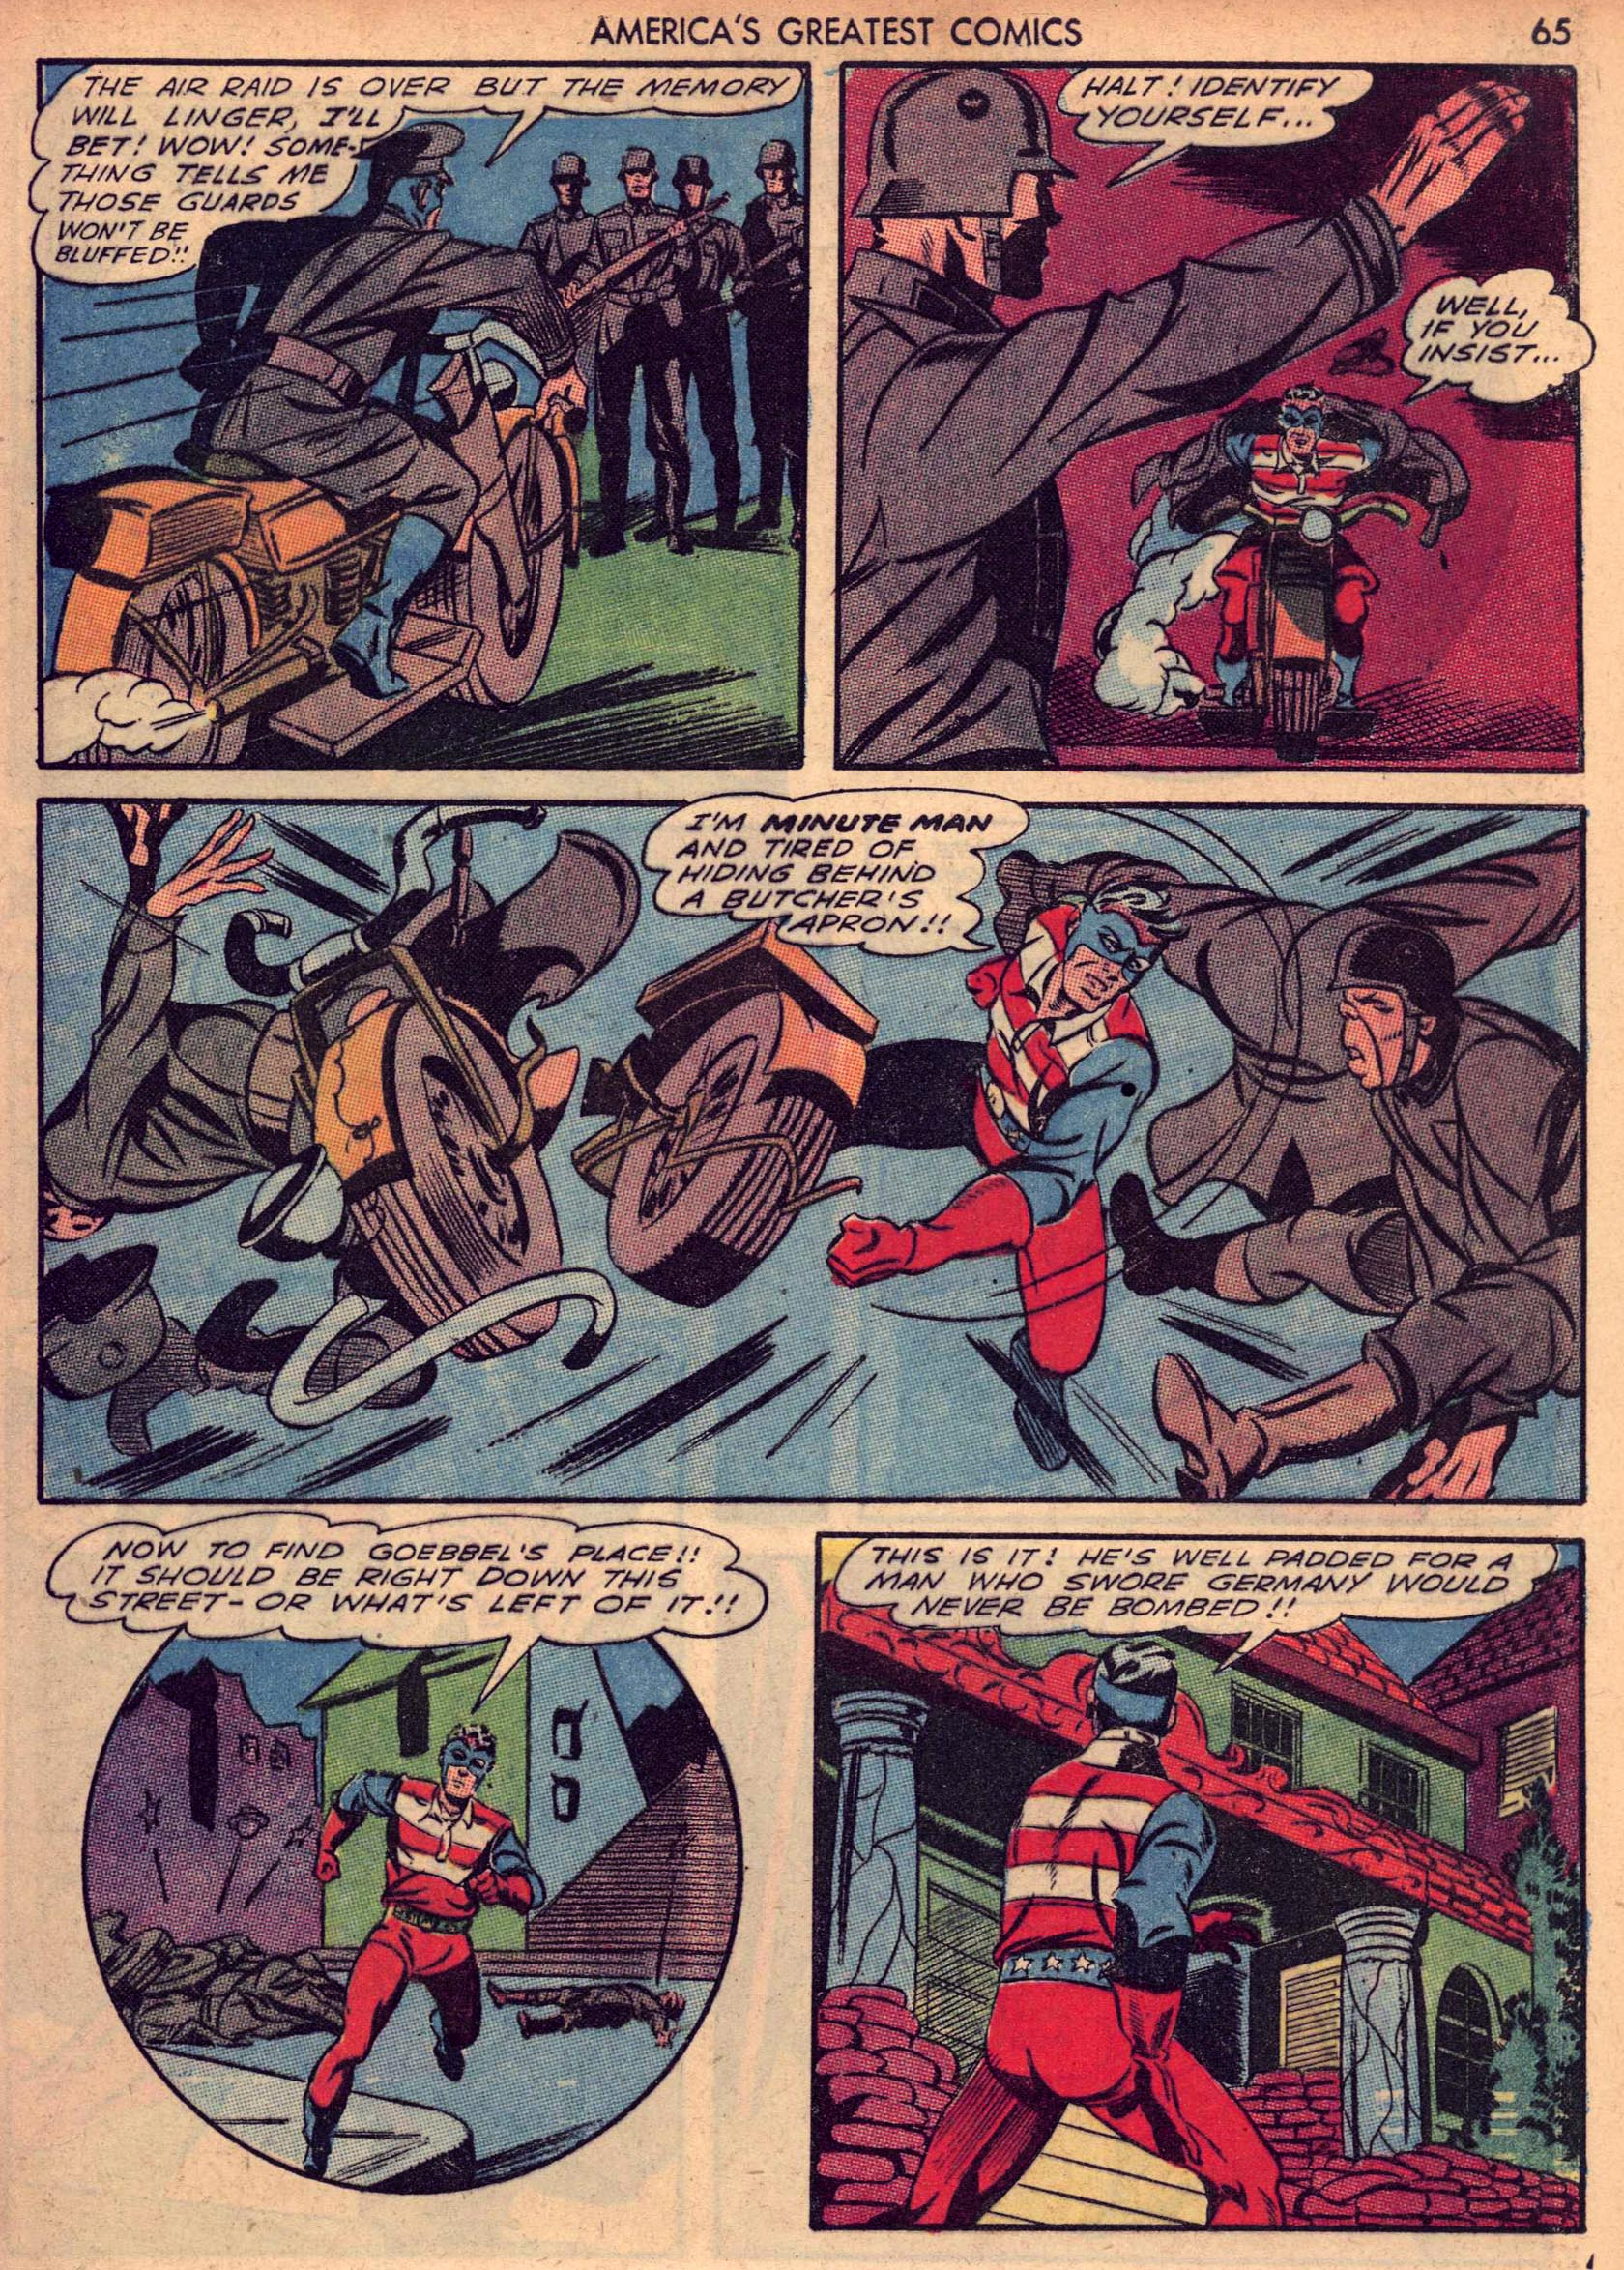 Read online America's Greatest Comics comic -  Issue #7 - 64